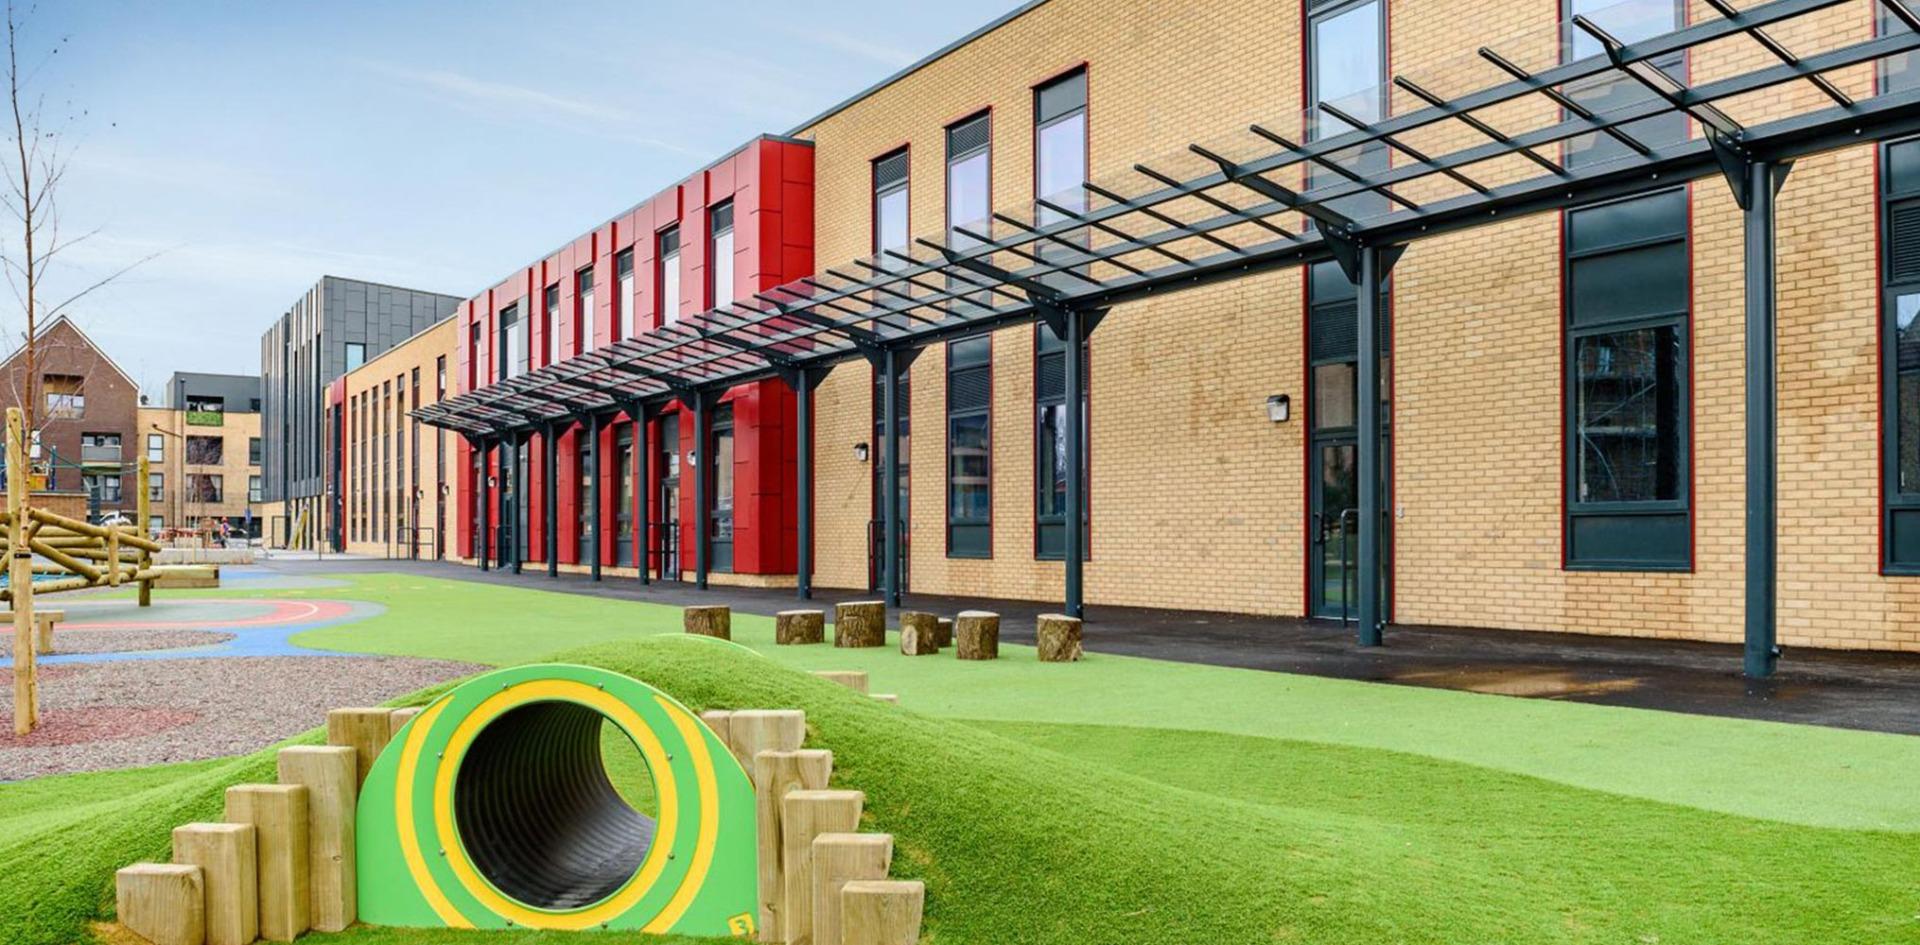 Robert Clack Lymington Fields School